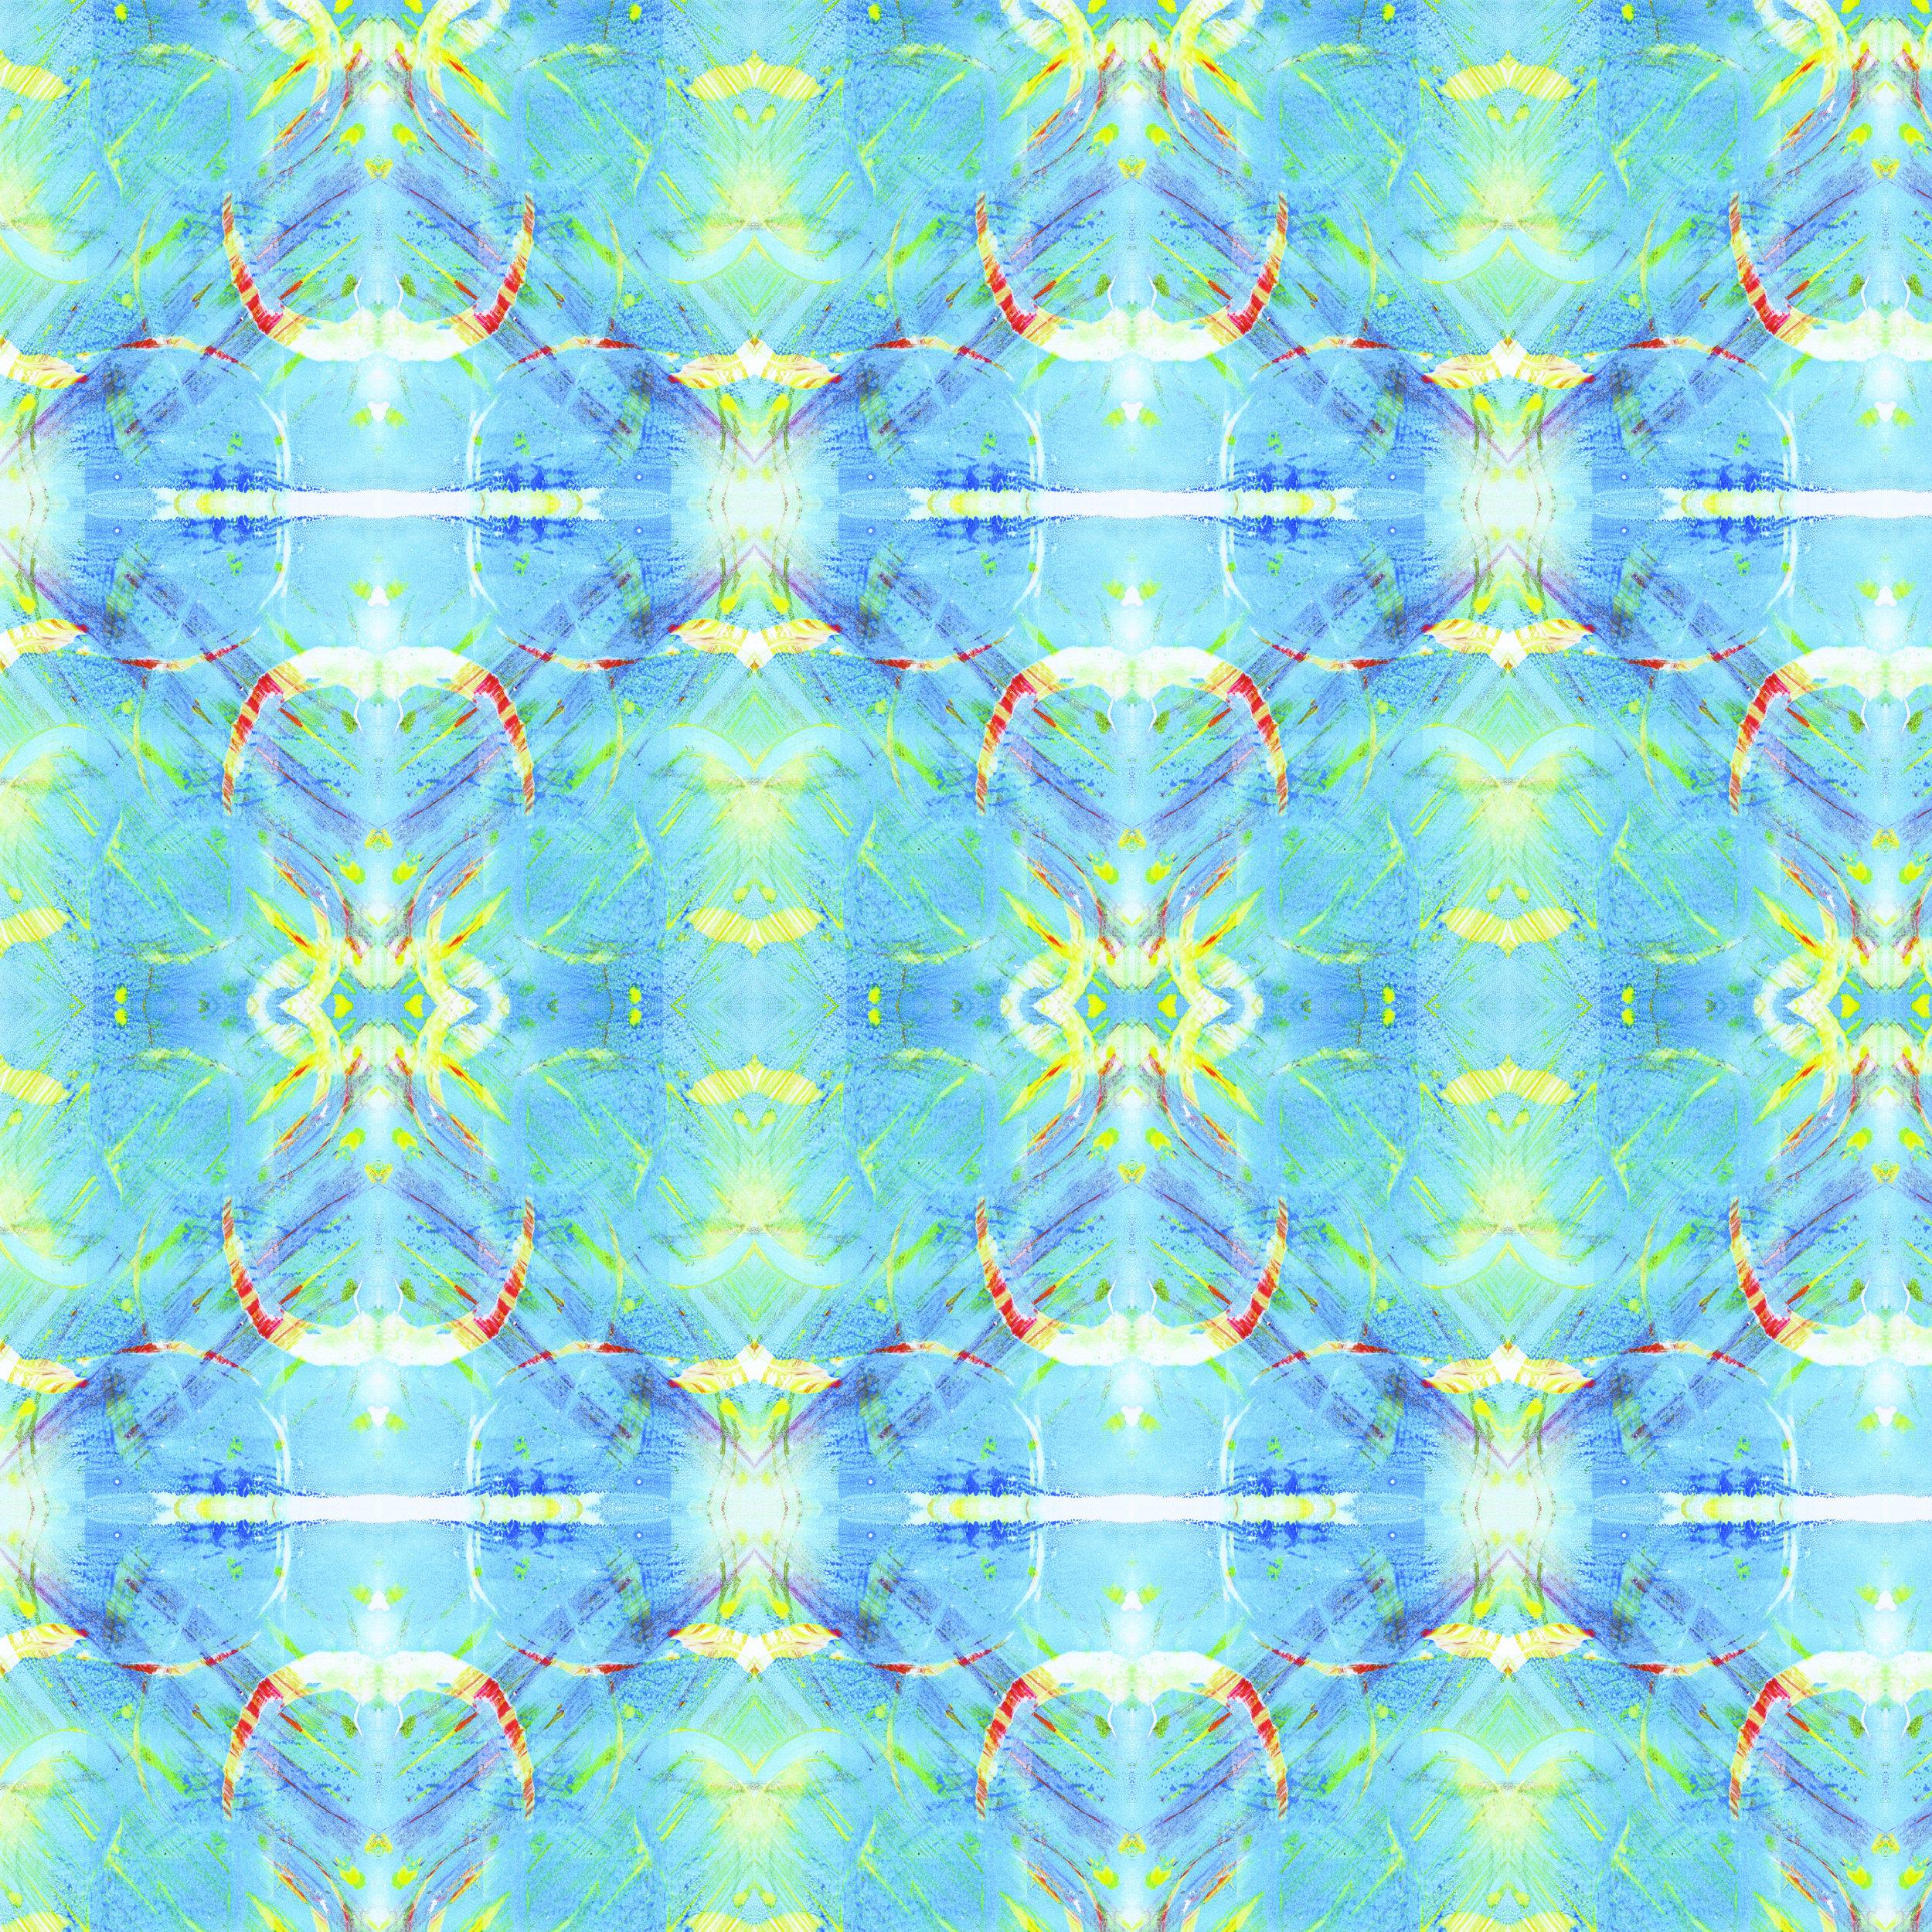 pattern_5.jpg